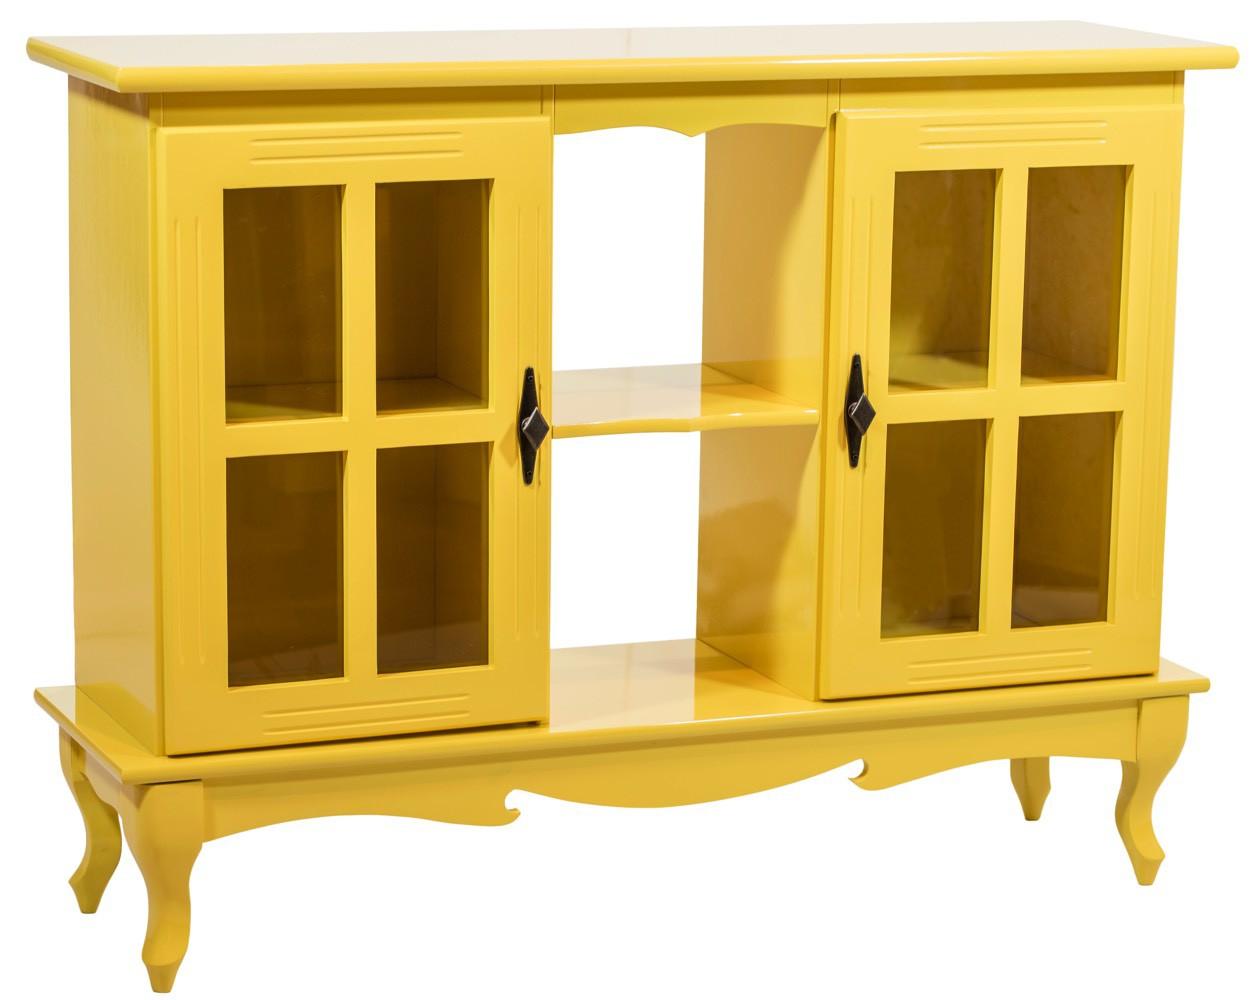 Cristaleira Horizontal 2 Portas - Amarela